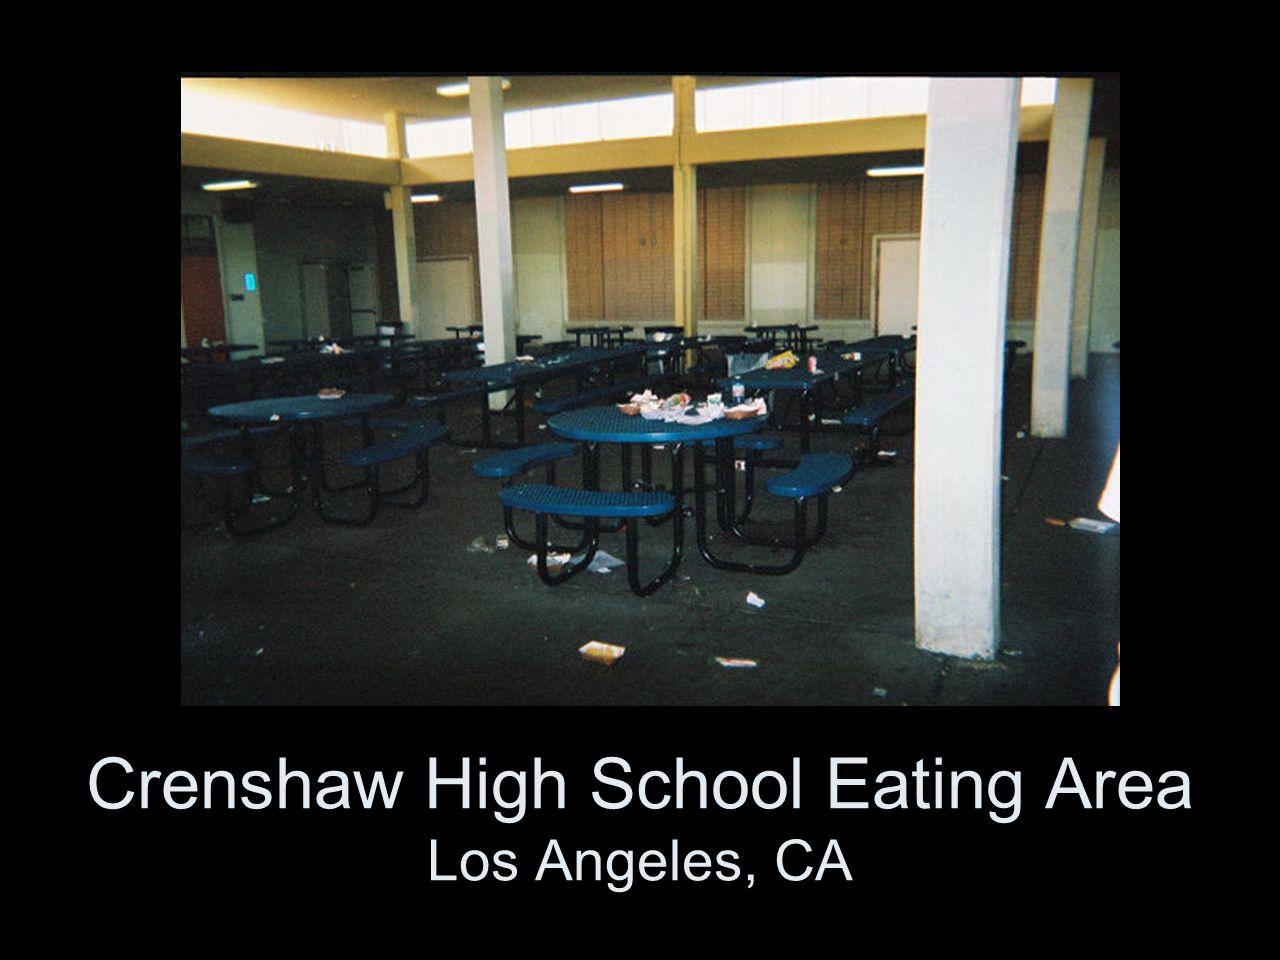 Crenshaw High School Eating Area Los Angeles, CA